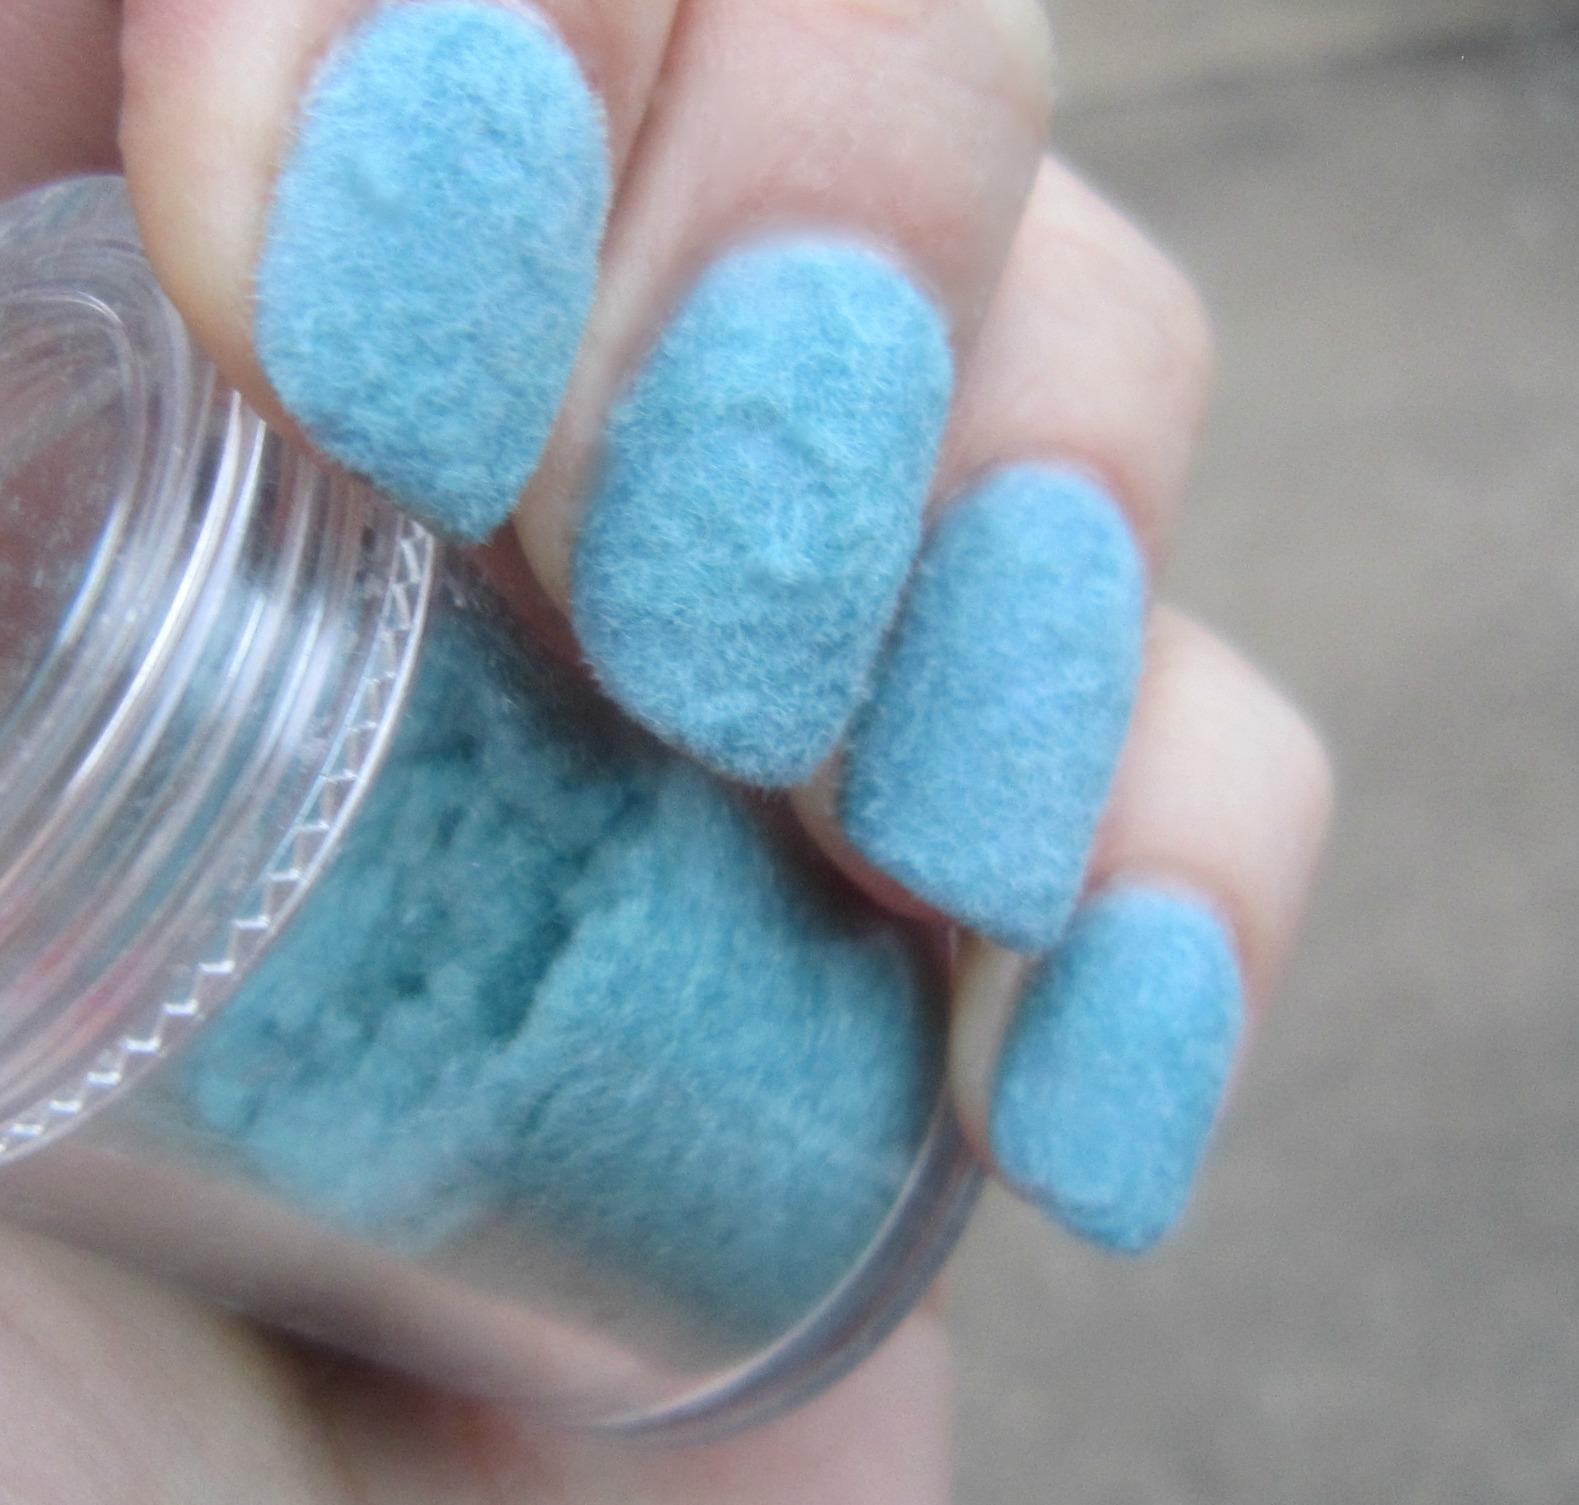 Concrete And Nail Polish Flocking Powder